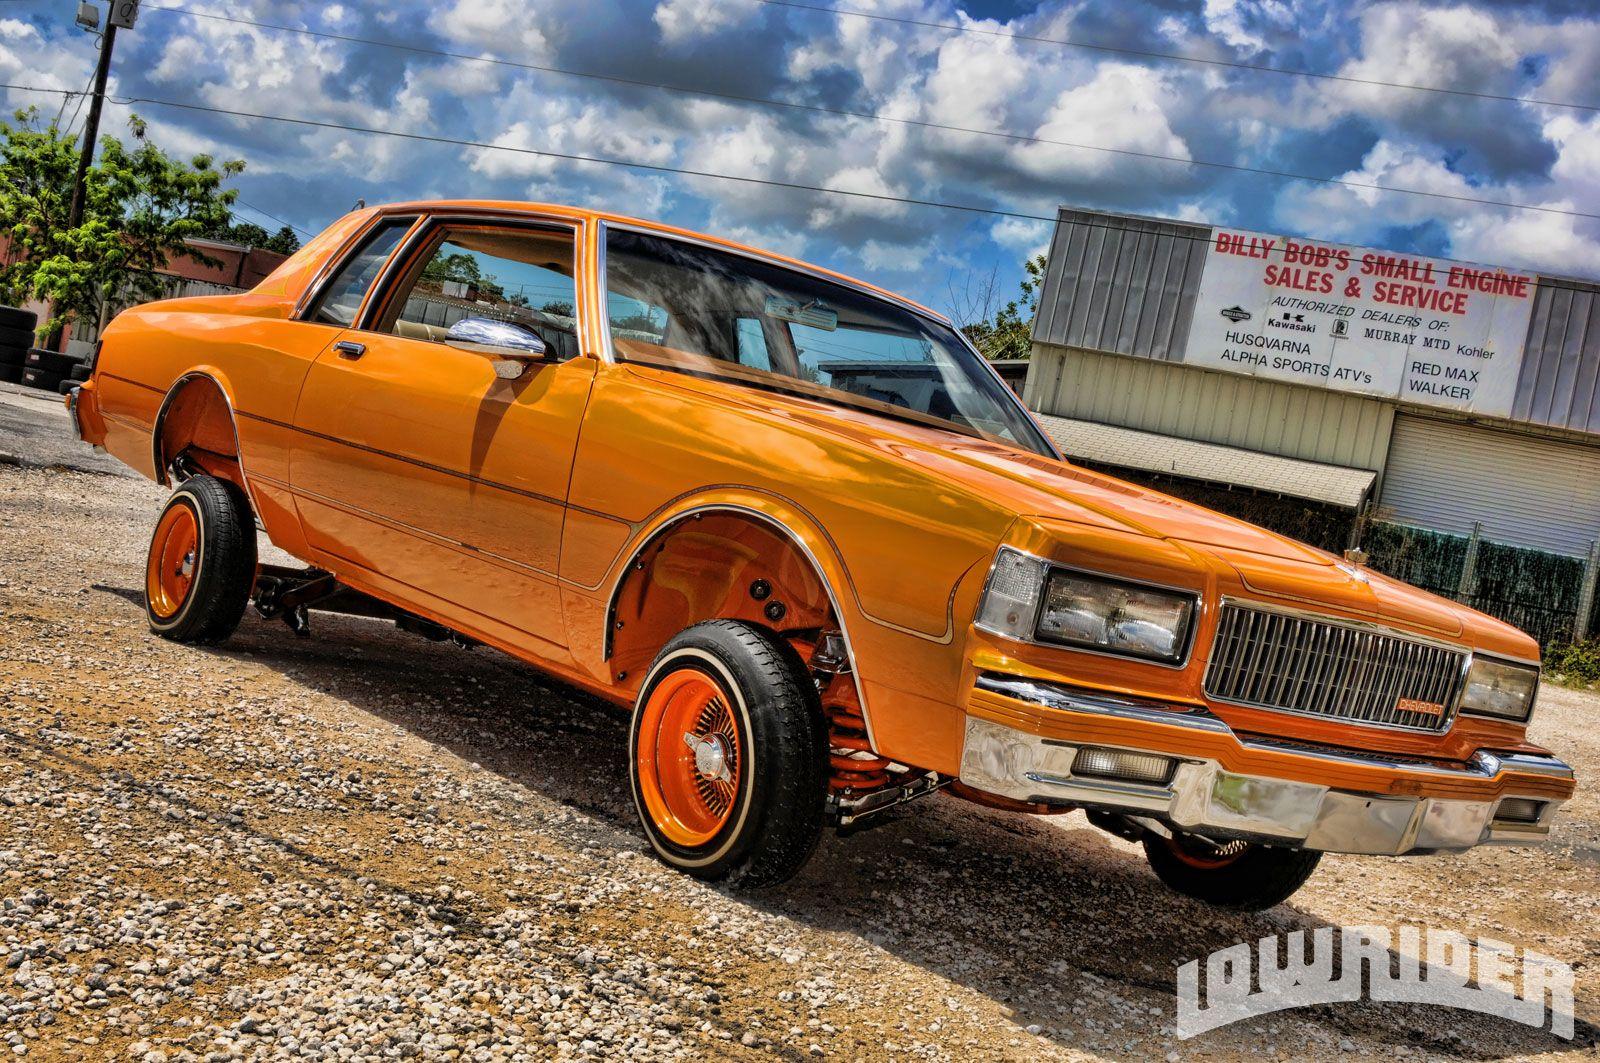 All Chevy chevy caprice 1985 : Orange 1985 Caprice Lowrider | Chevrolet Box Wheelzz | Pinterest ...